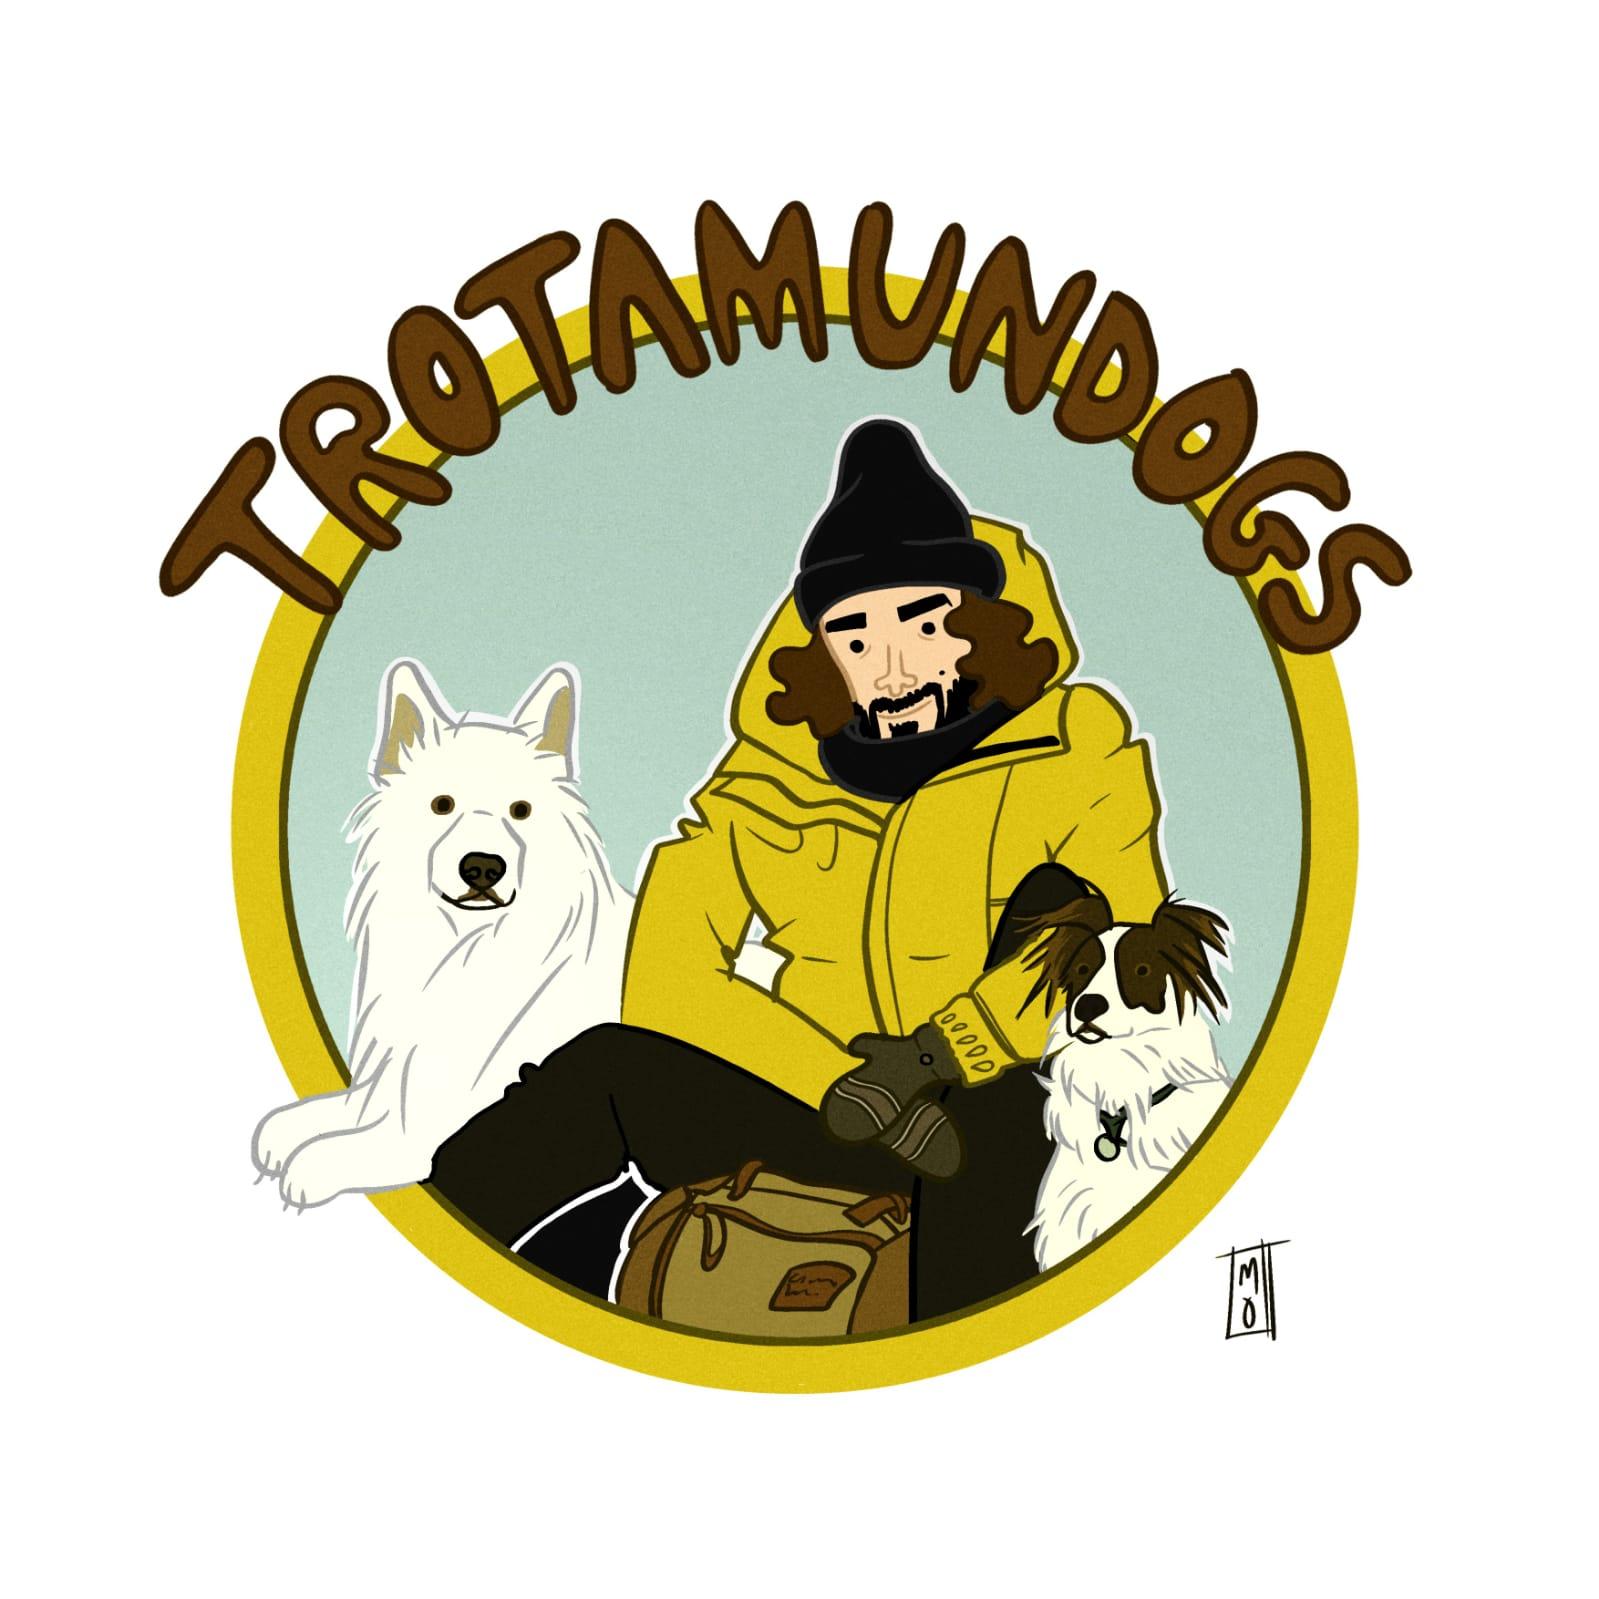 logo Trotamundogs